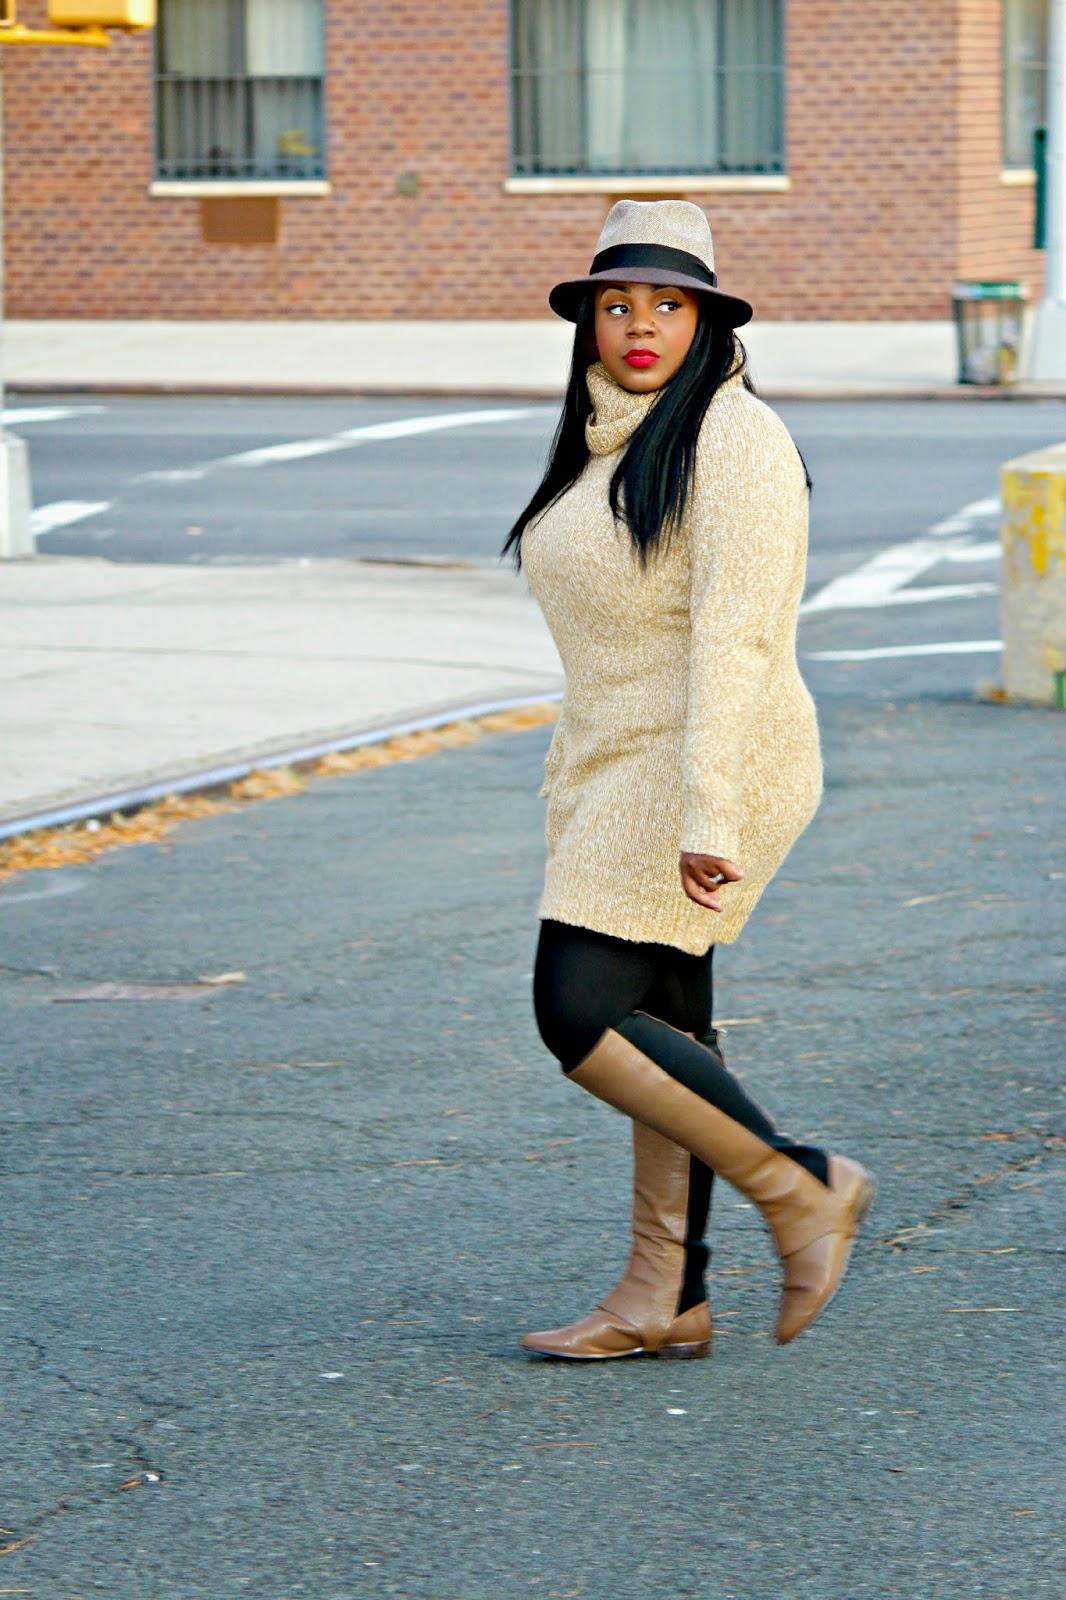 h&M turtleneck sweater dress